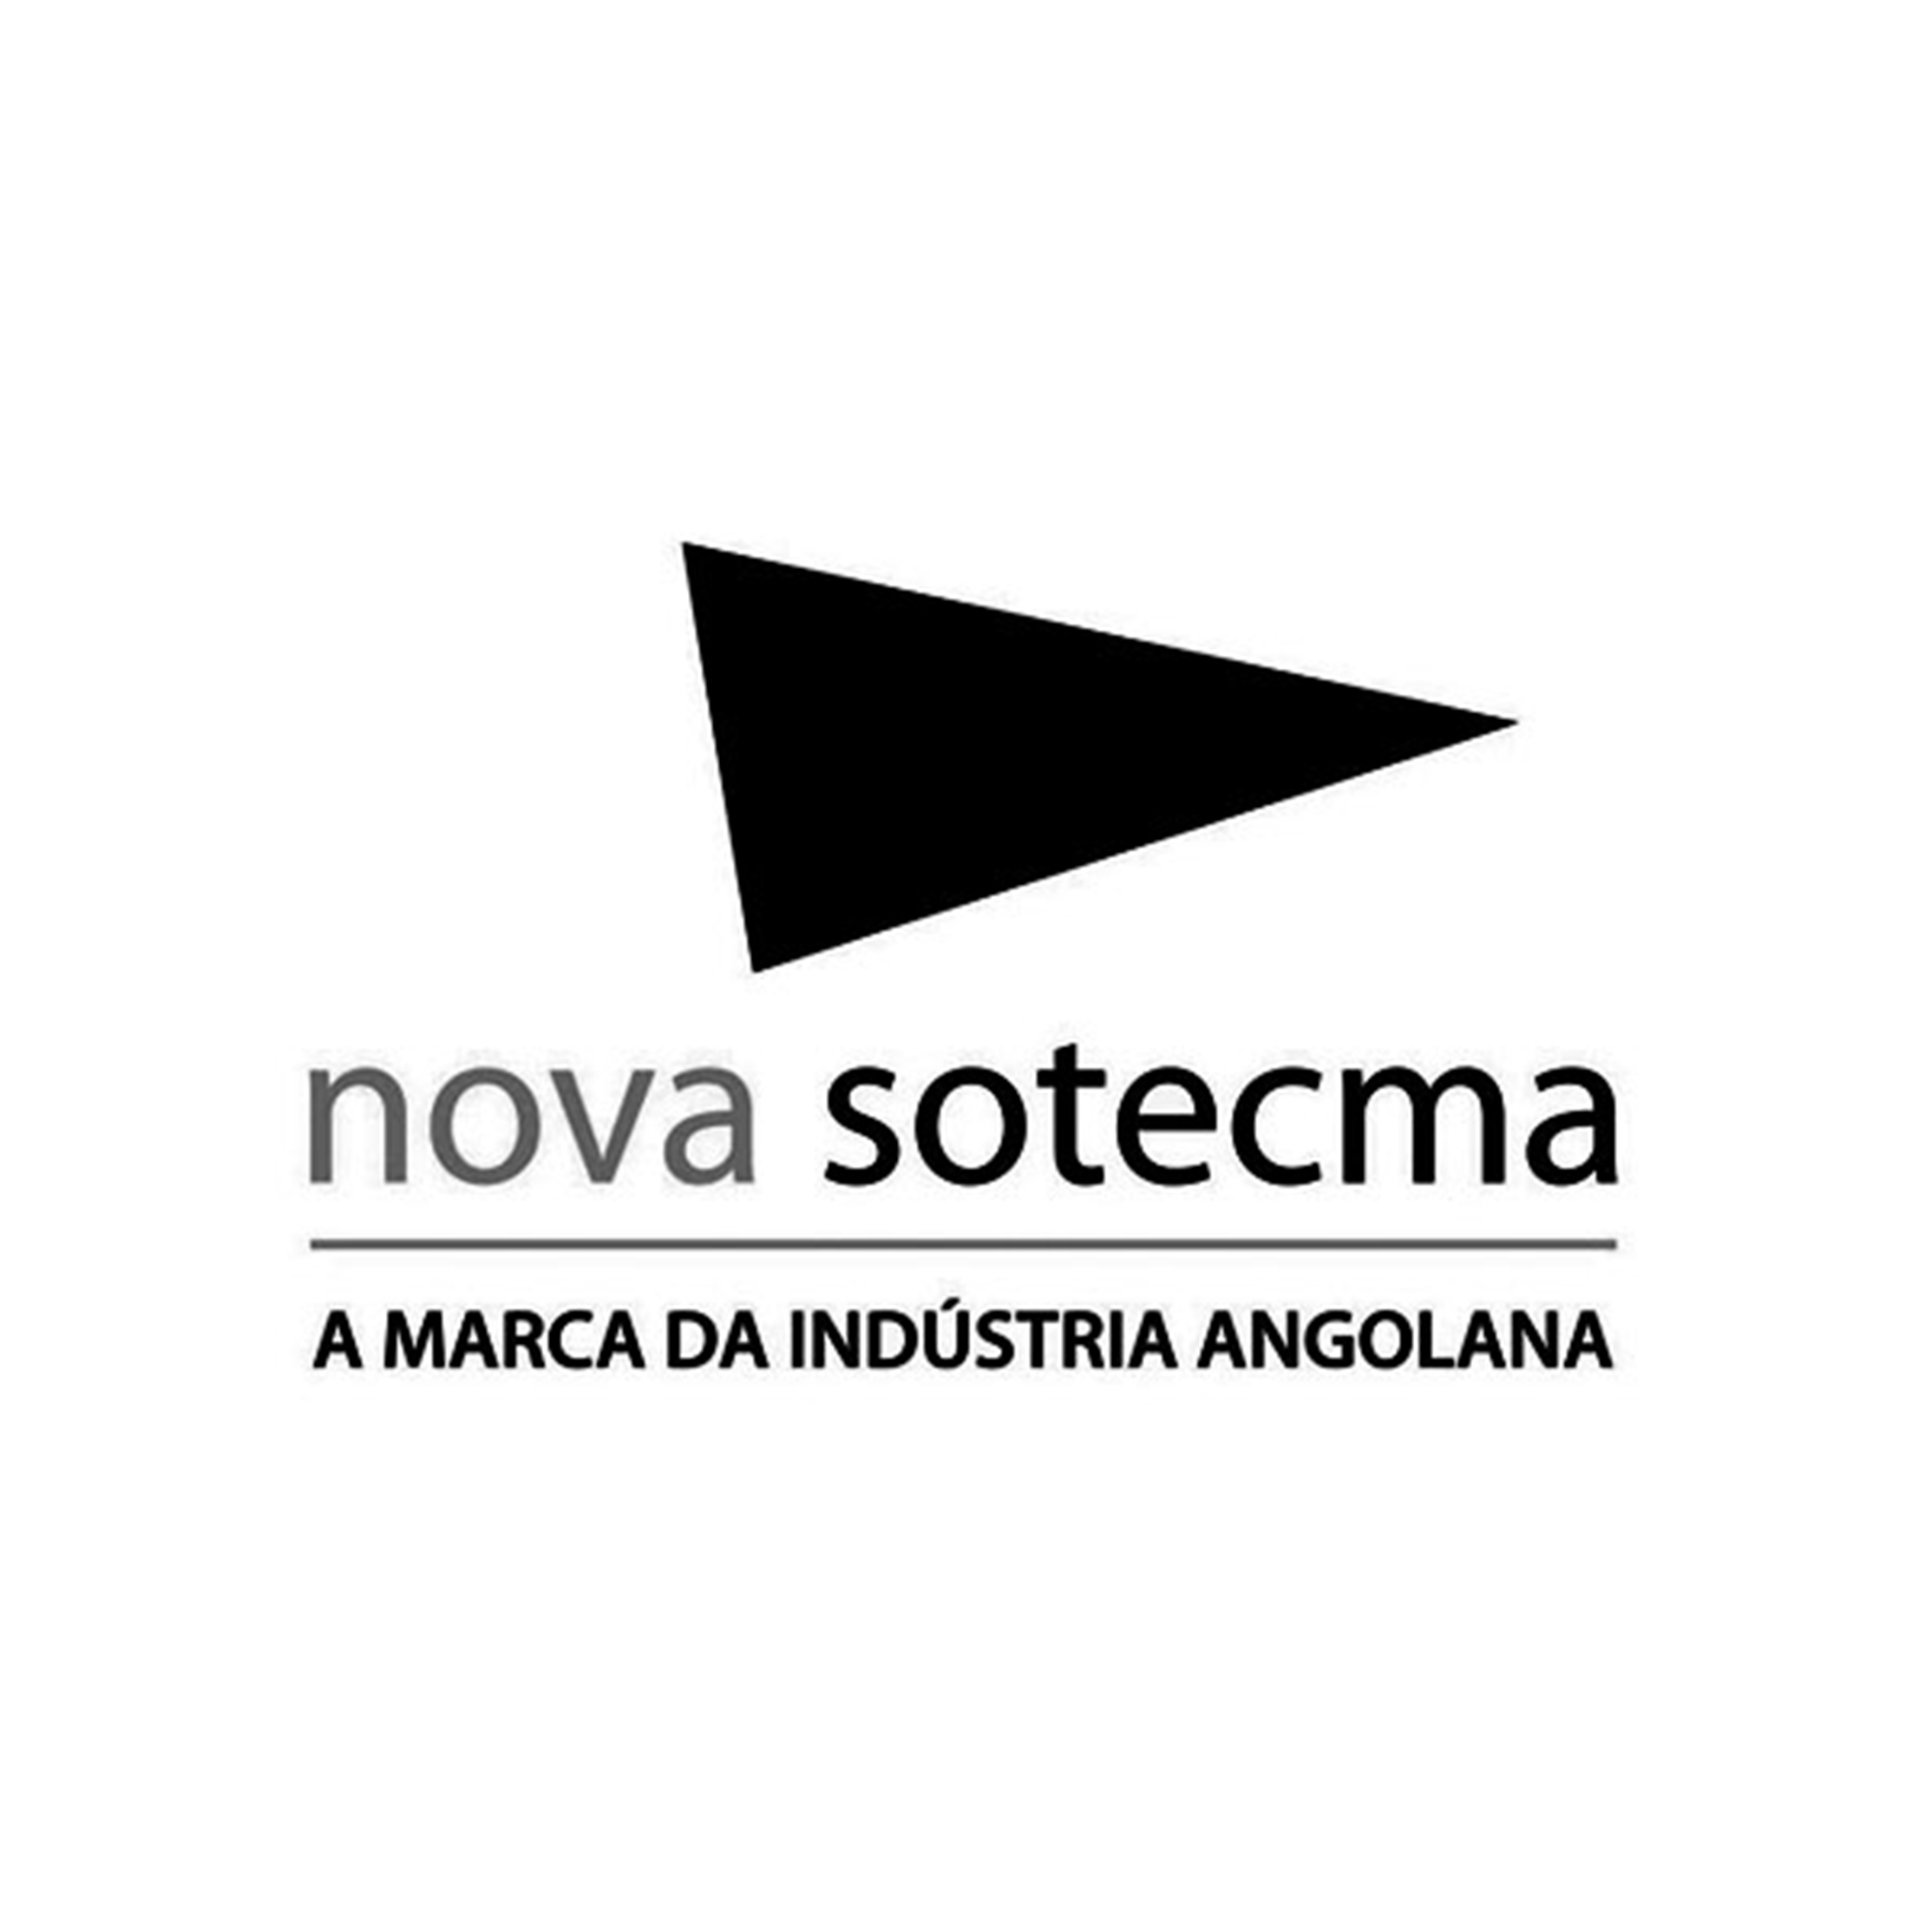 novasotecma_logo.jpg